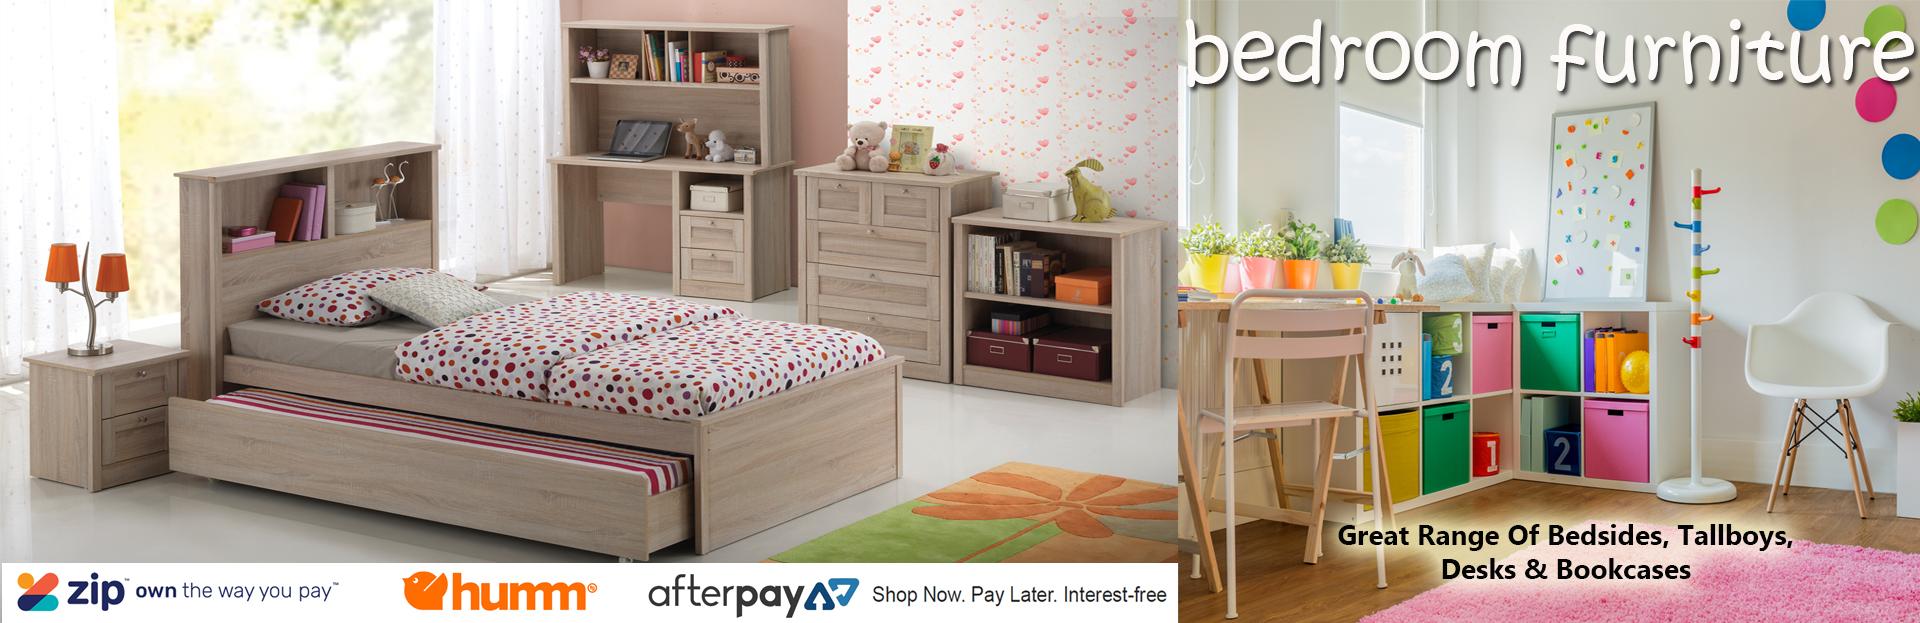 Kids Bedroom Furniture Australia Awesome Beds 4 Kids